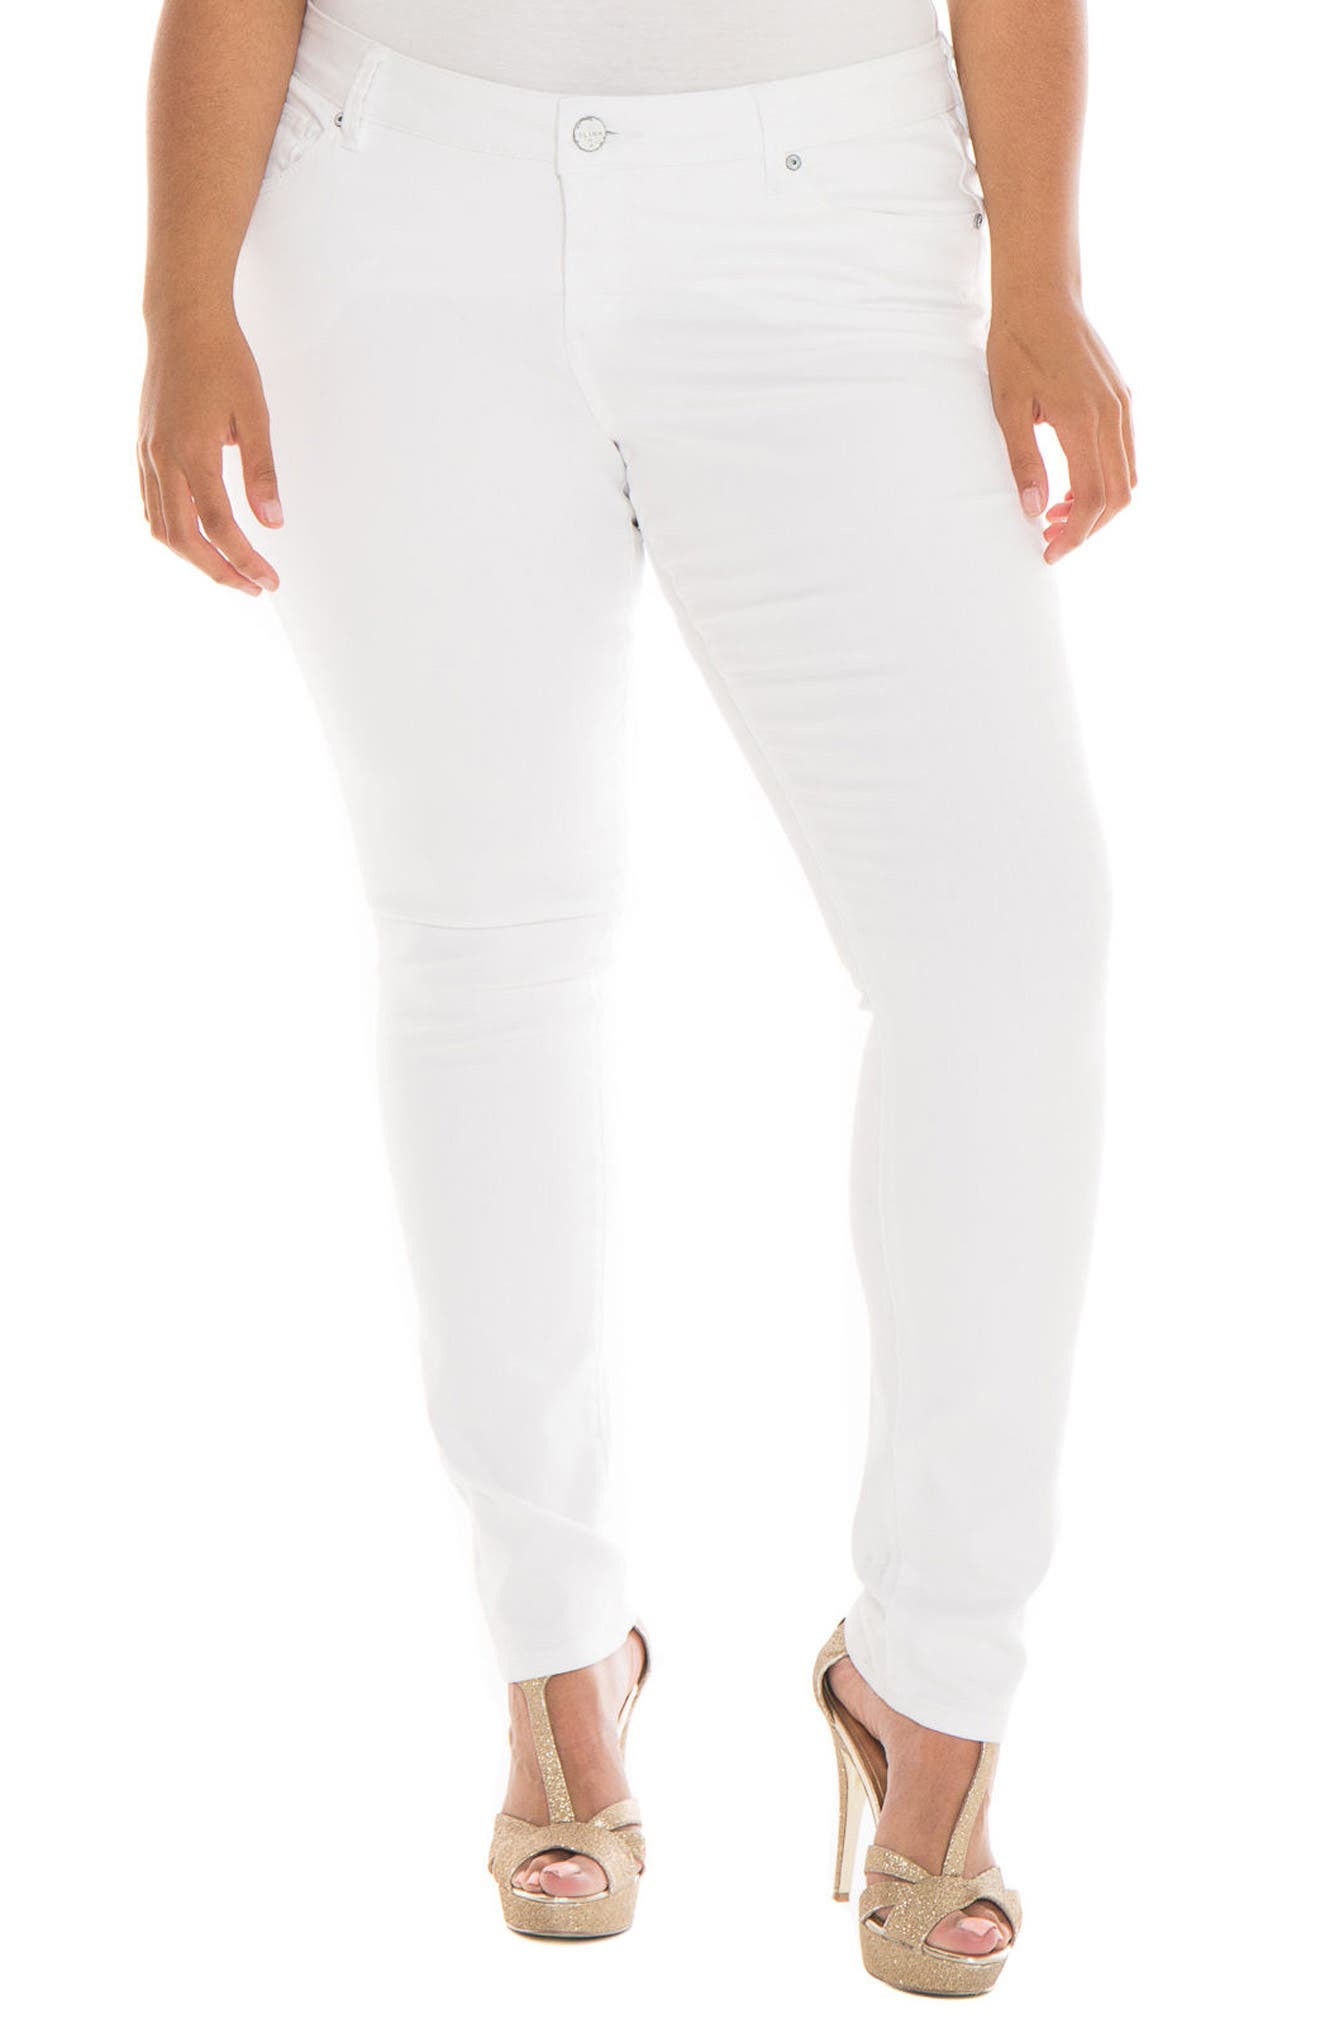 Alternate Image 1 Selected - SLINK Jeans Skinny Jeans (Charlie) (Plus Size)